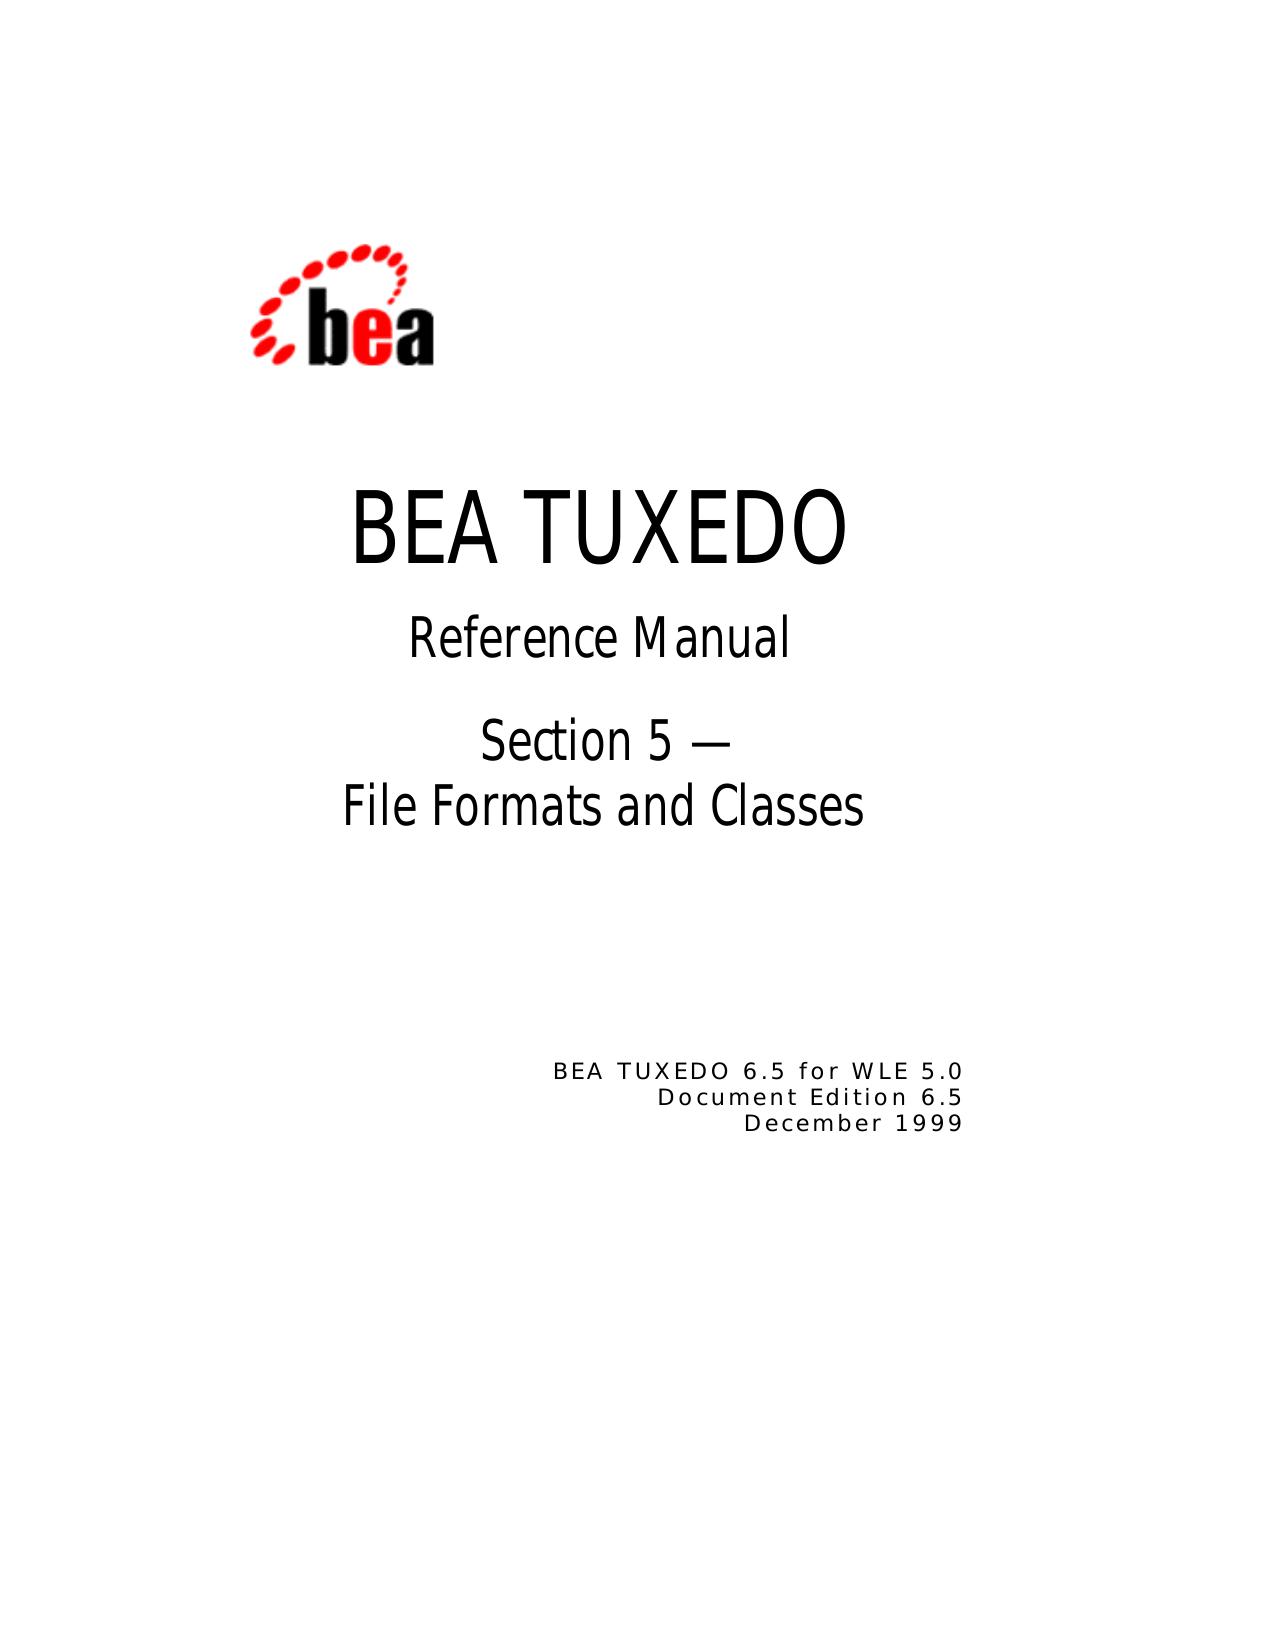 bea tuxedo - Oracle Help Center   manualzz com